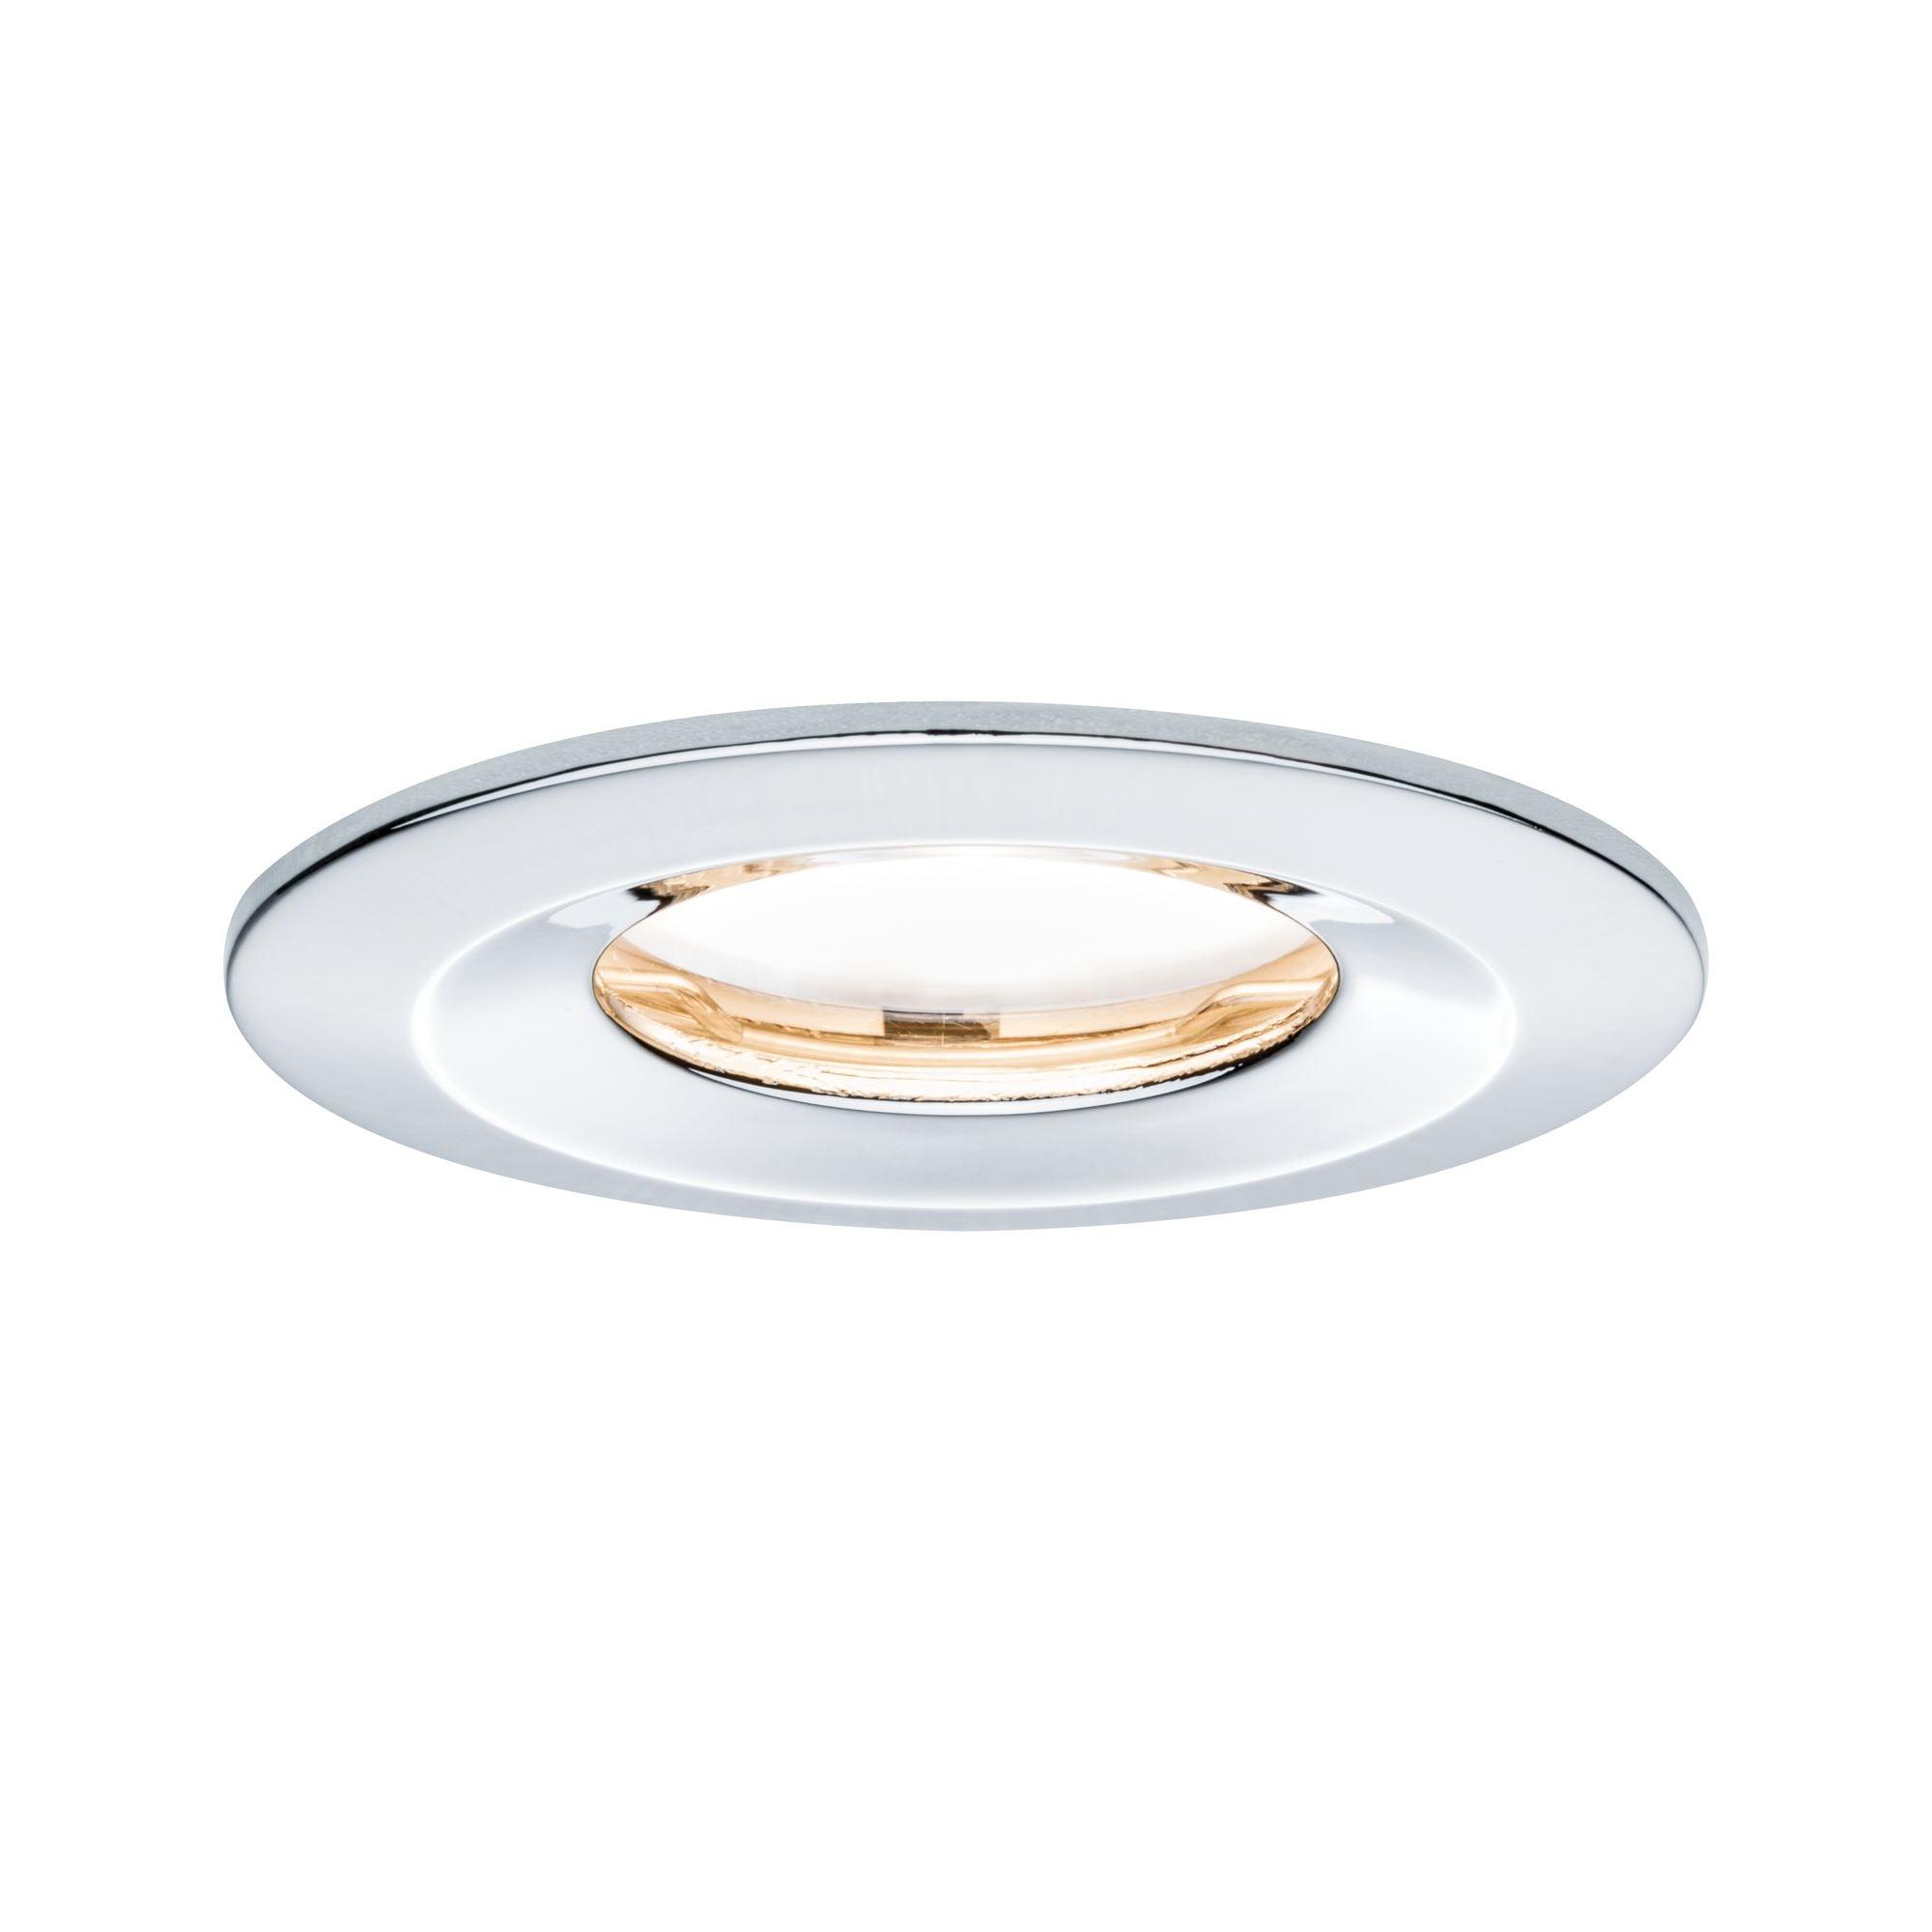 Paulmann LED Einbaustrahler dimmbar IP65 rund Chrom Coin Slim 6,8W, 1 St., Warmweiß